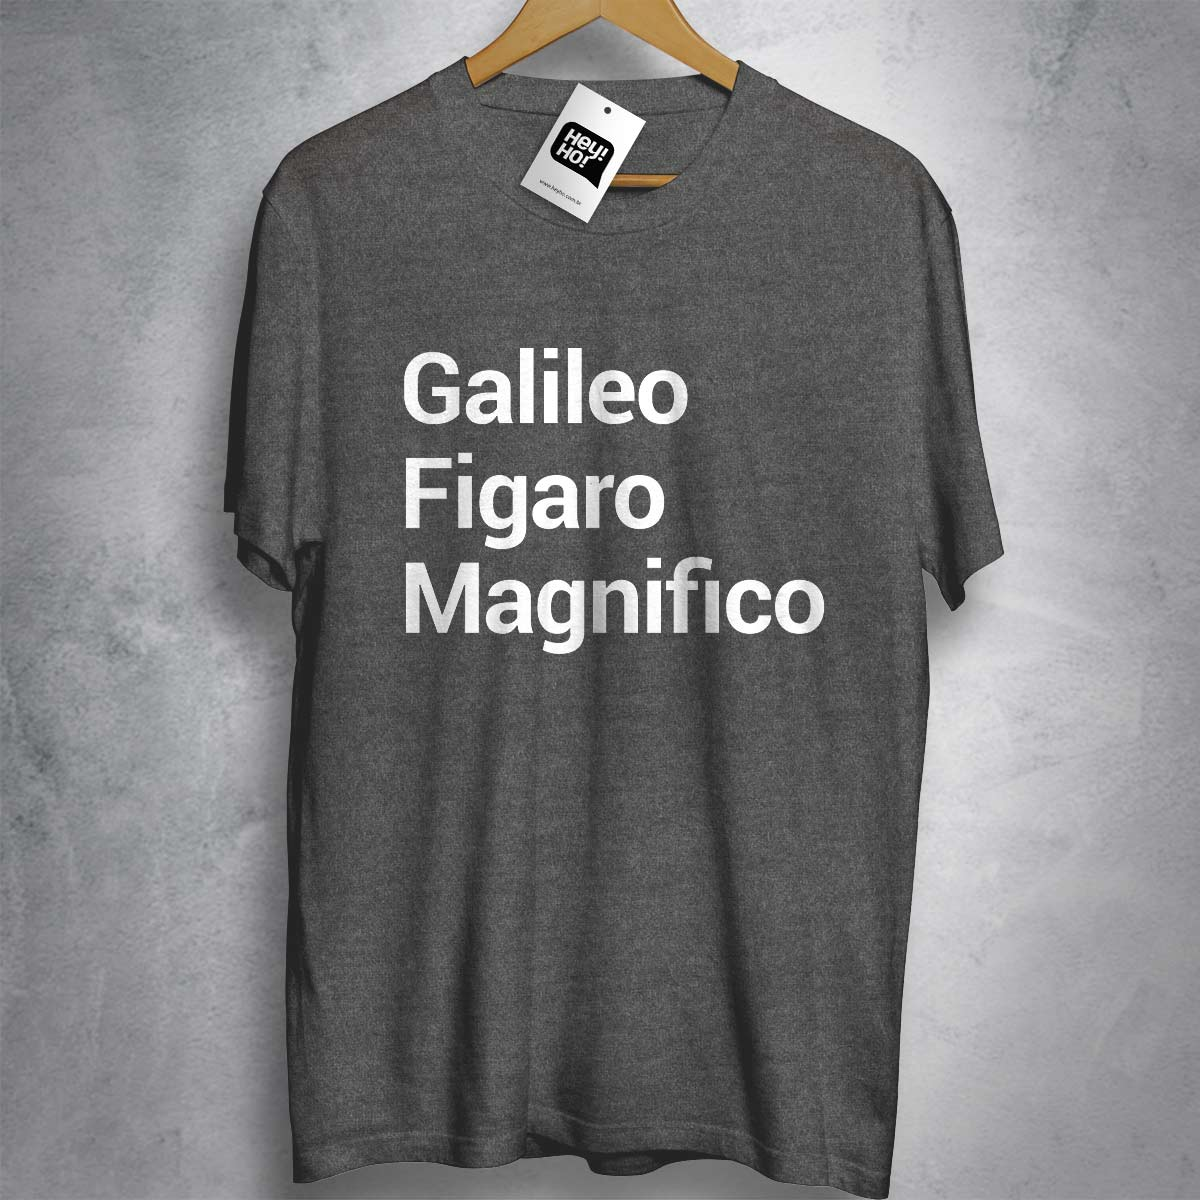 QUEEN - Galileo Figaro Magnifico